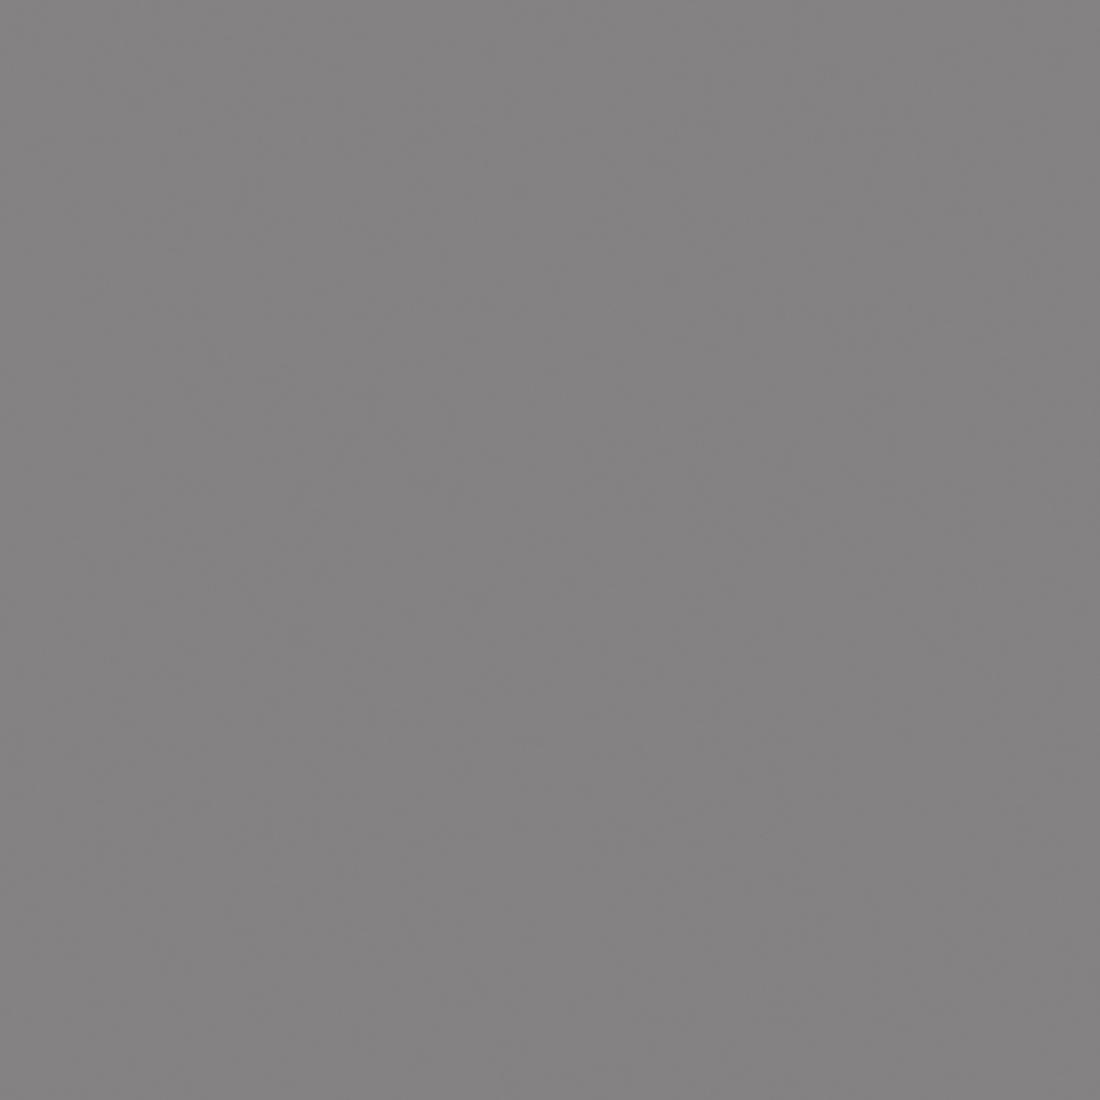 0171PE - Gris Oscuro